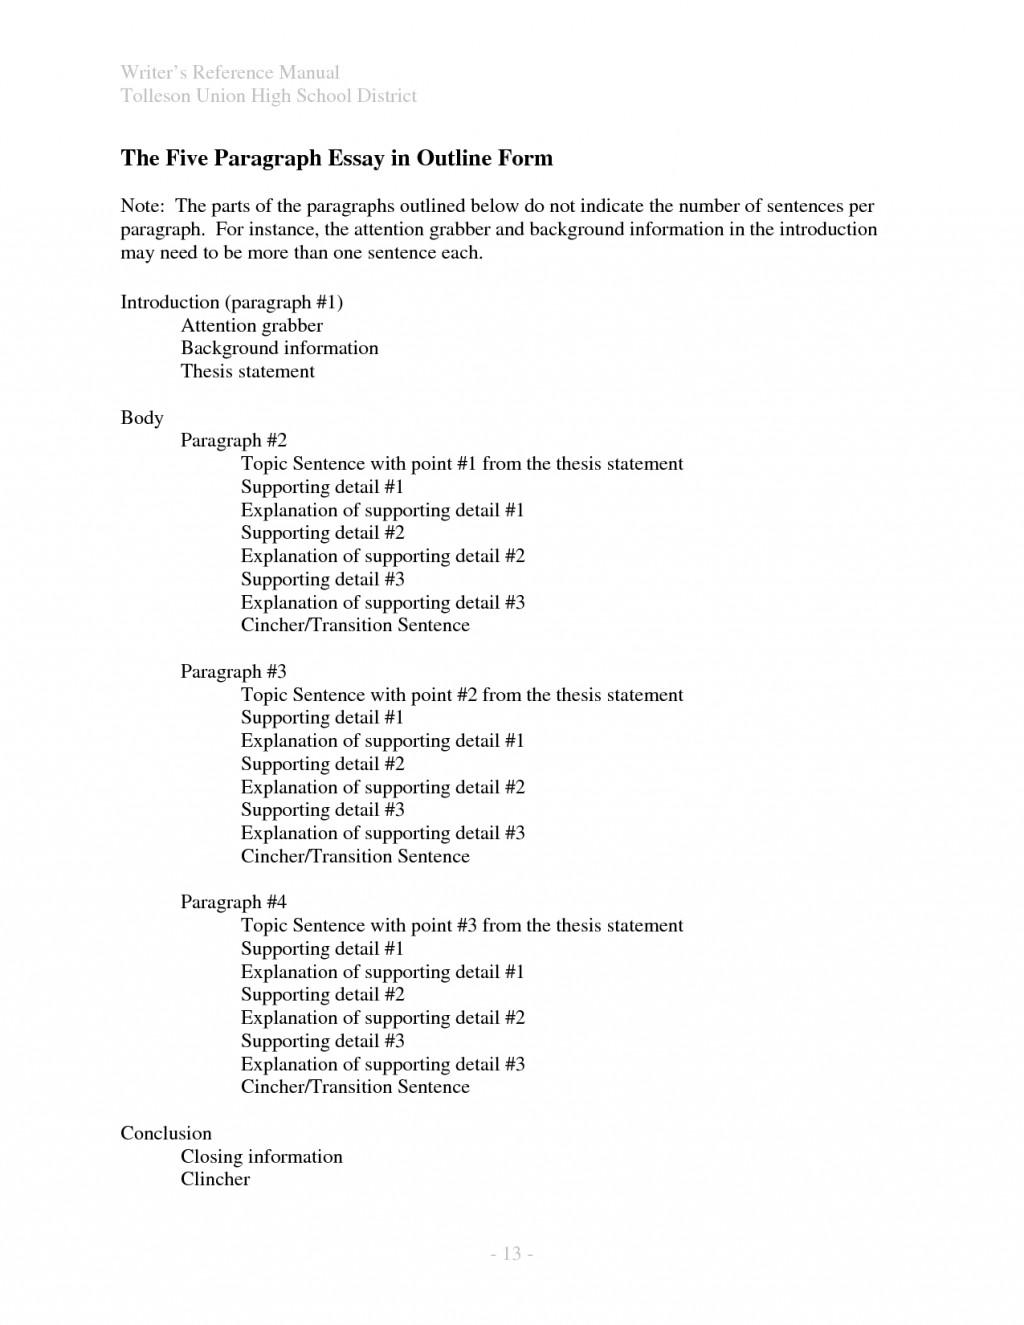 005 Argumentative Essay College Outline Pdf Printables Corner Seaapi Com Wp Content Uploads Argumentativ Caus Stupendous Topics For Middle School Simple Persuasive High Large